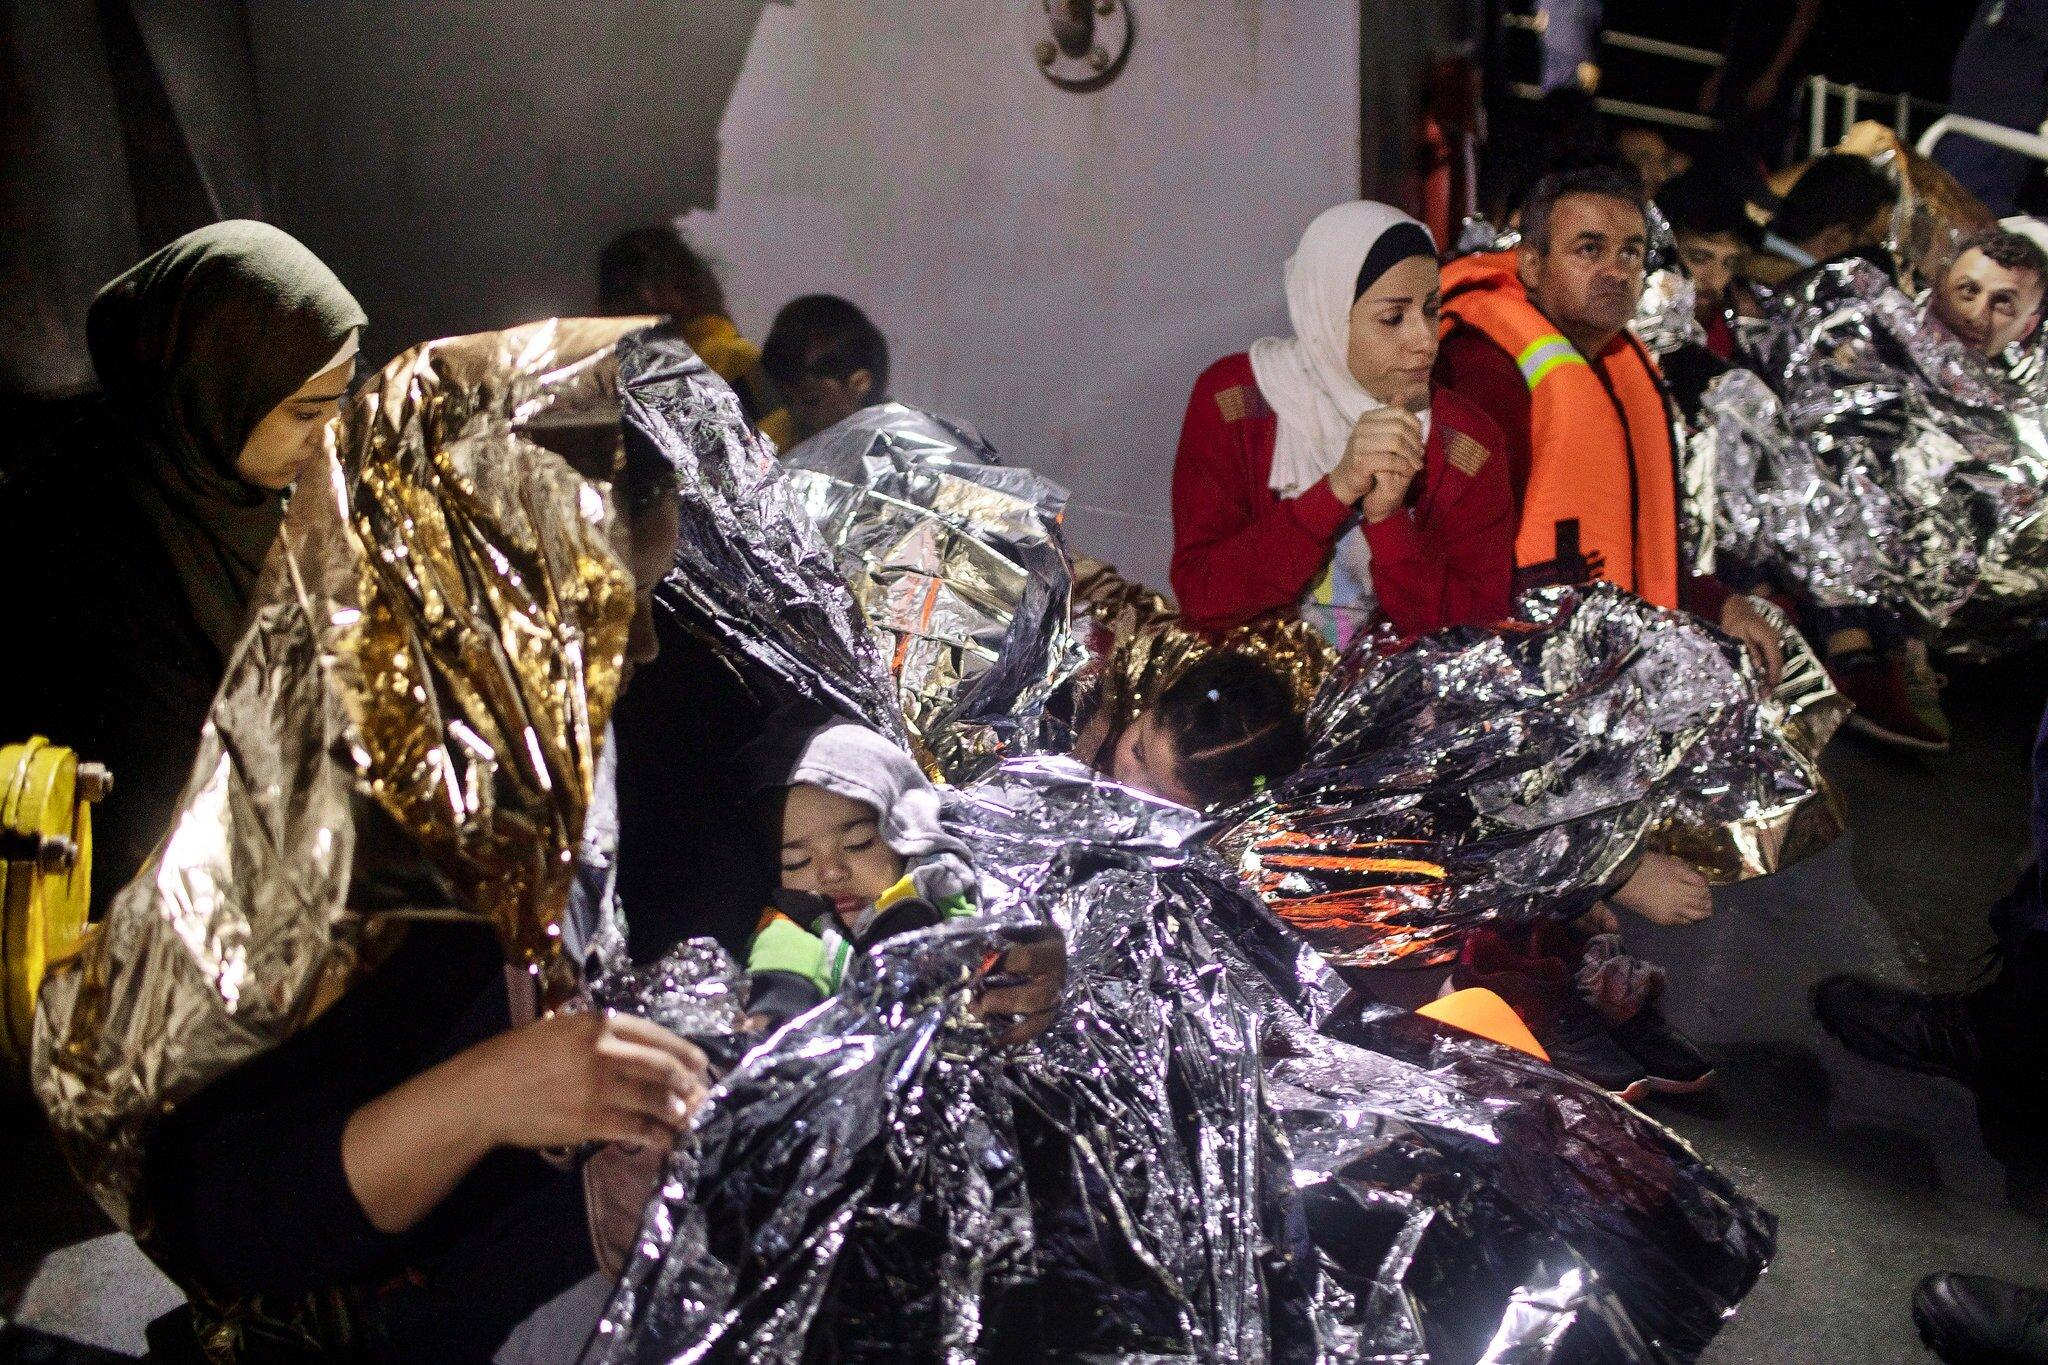 Refugees were rescued Thursday by a Greek Coast Guard ship near the island of Samos. Credit Petros Giannakouris/Associated Press